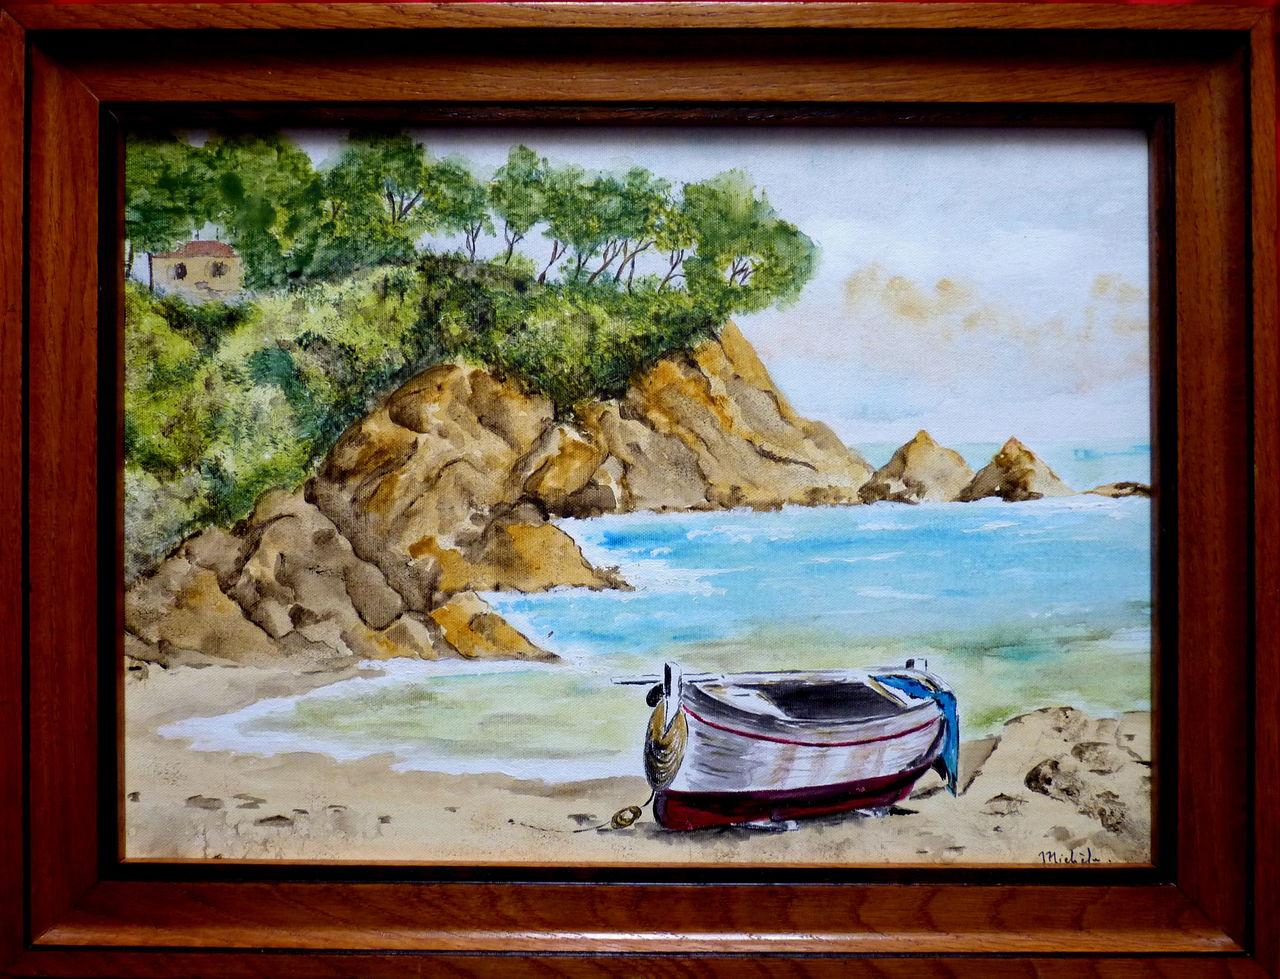 Michele martin Une barque sur la plage.